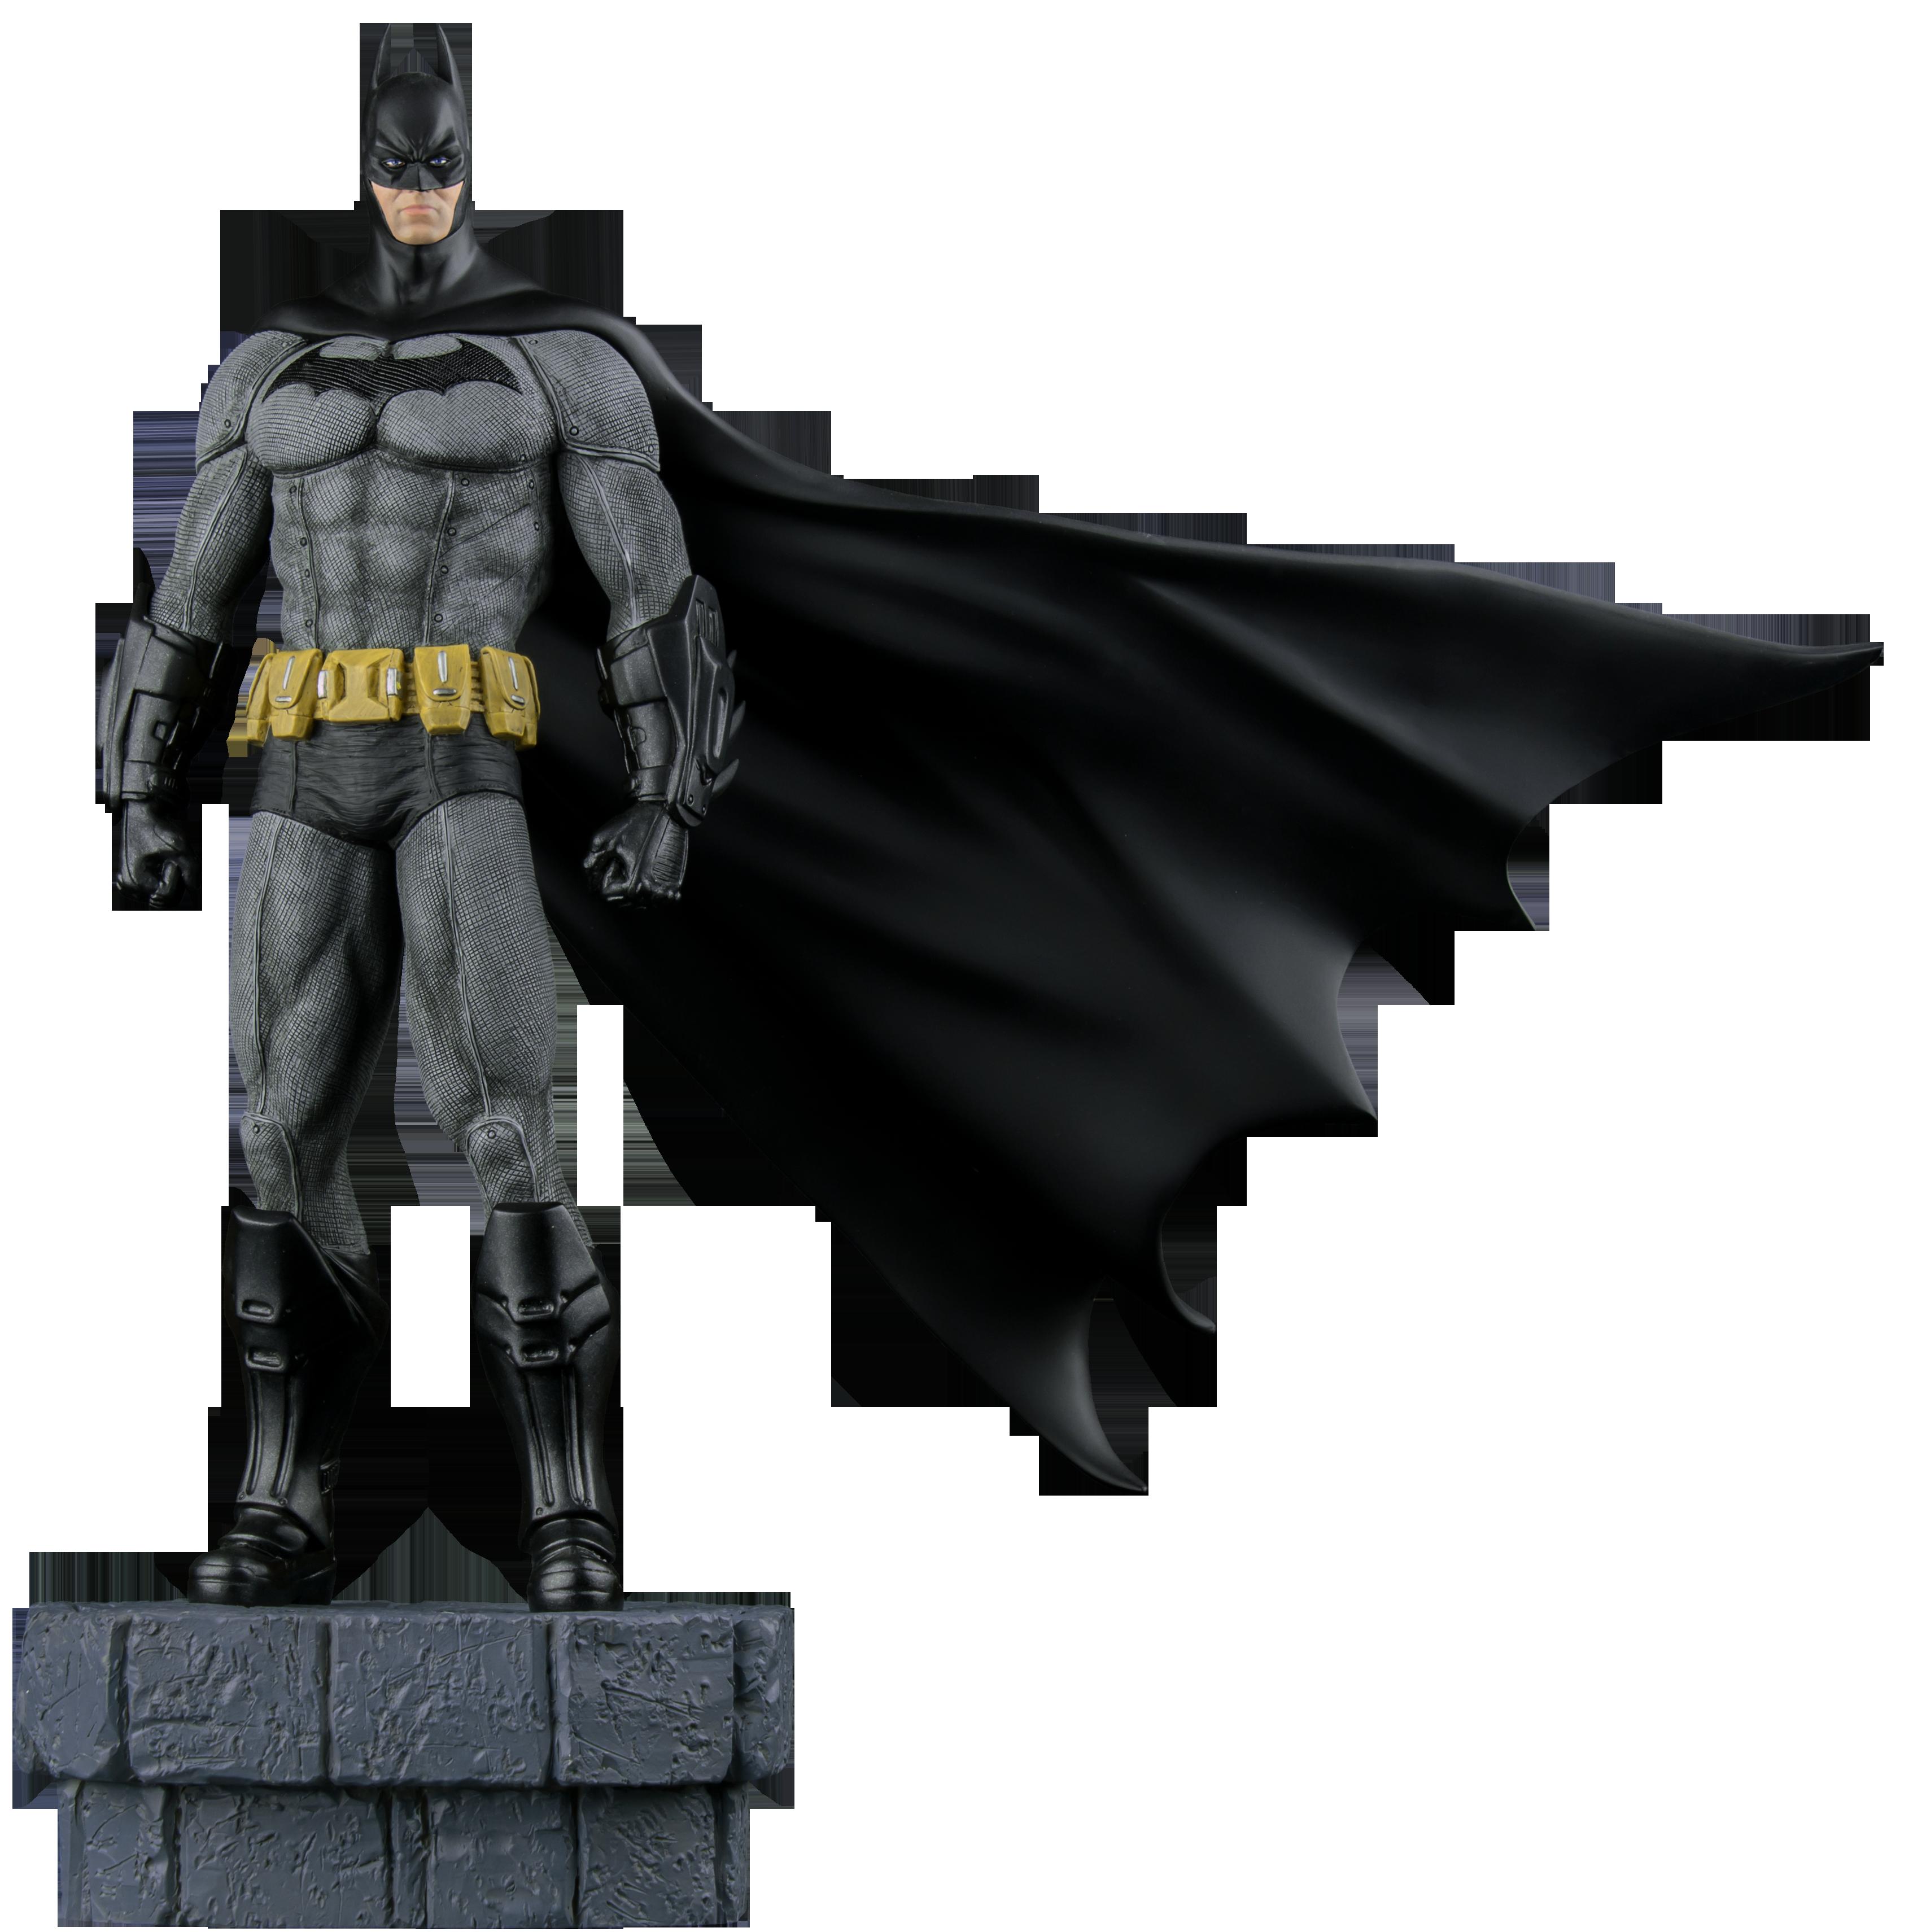 Arkham Batman Png Image Batman Arkham City Batman Arkham City